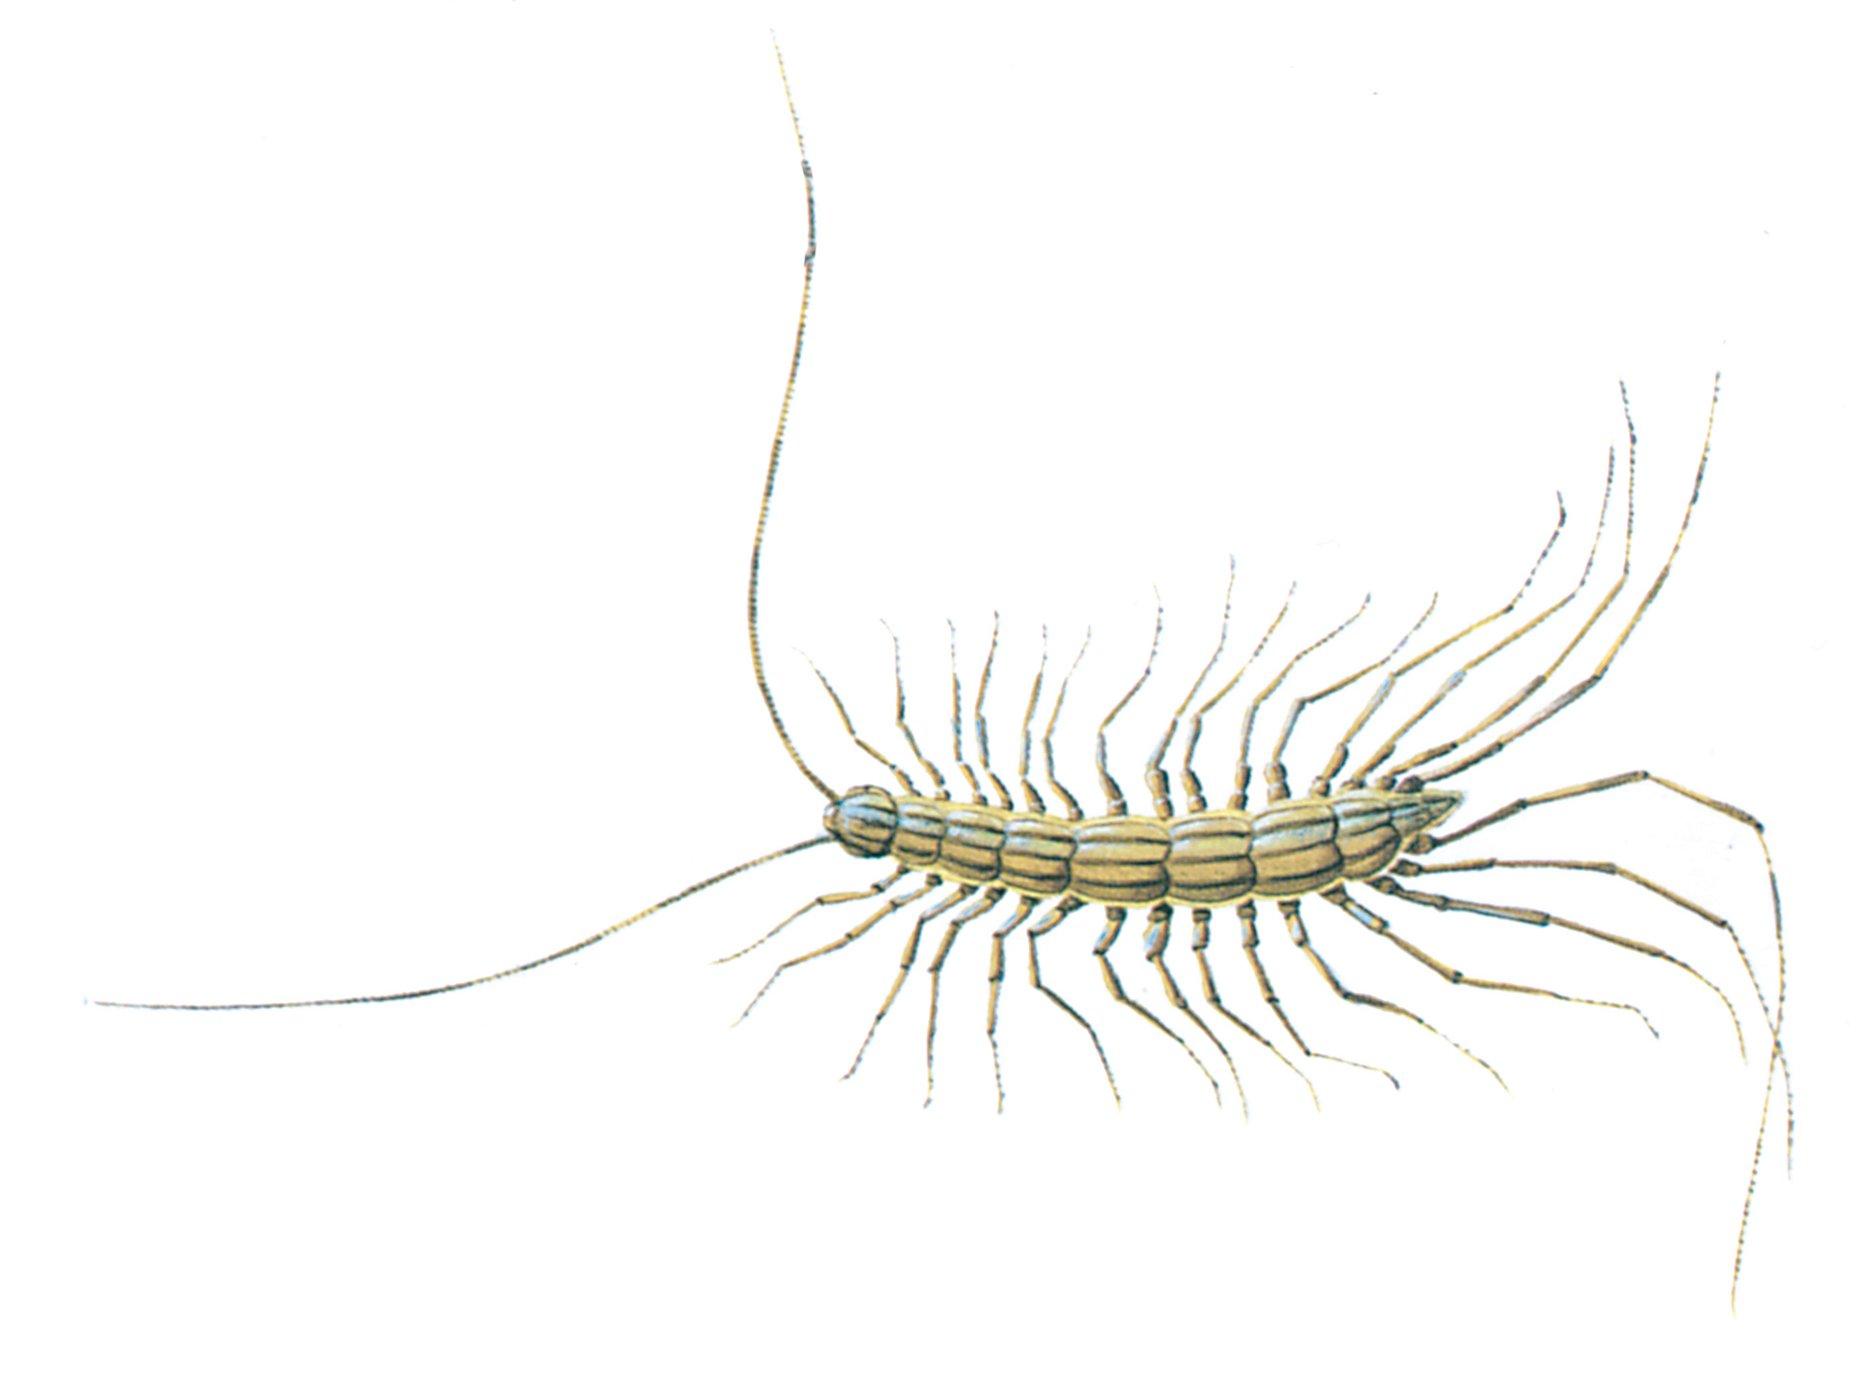 hight resolution of centipedes